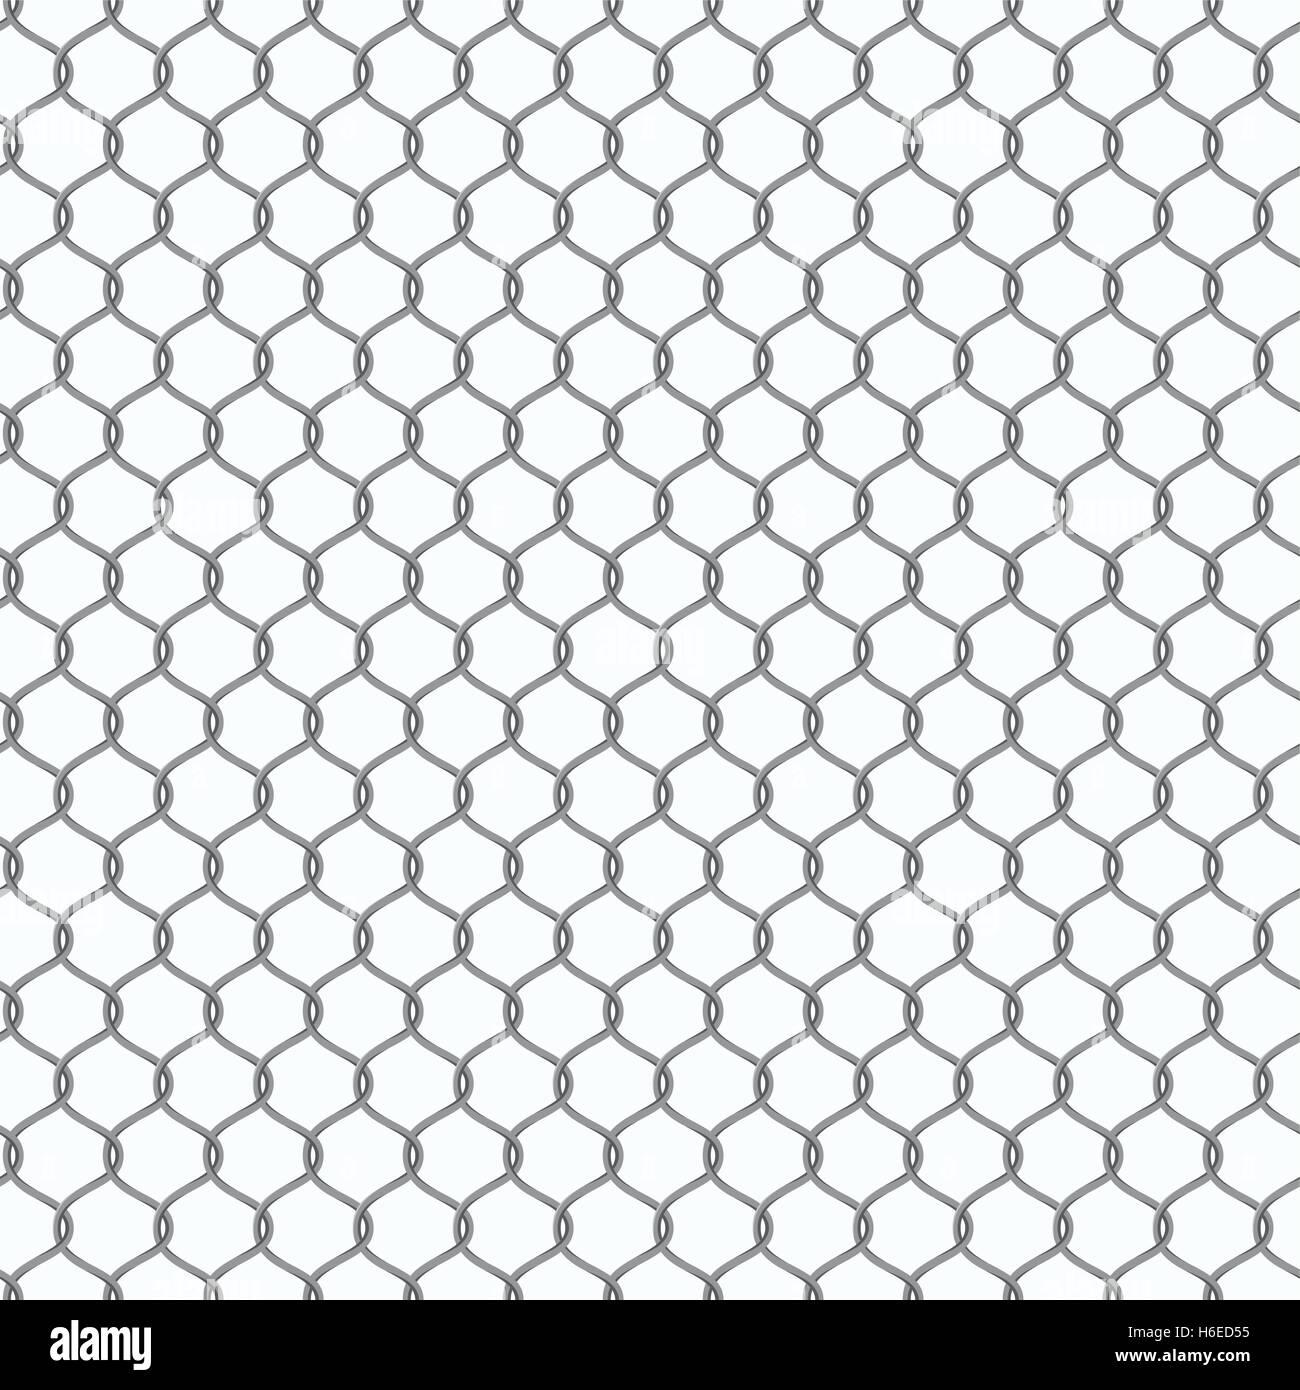 Wunderbar Drahtring Muster Ideen - Schaltplan Serie Circuit ...